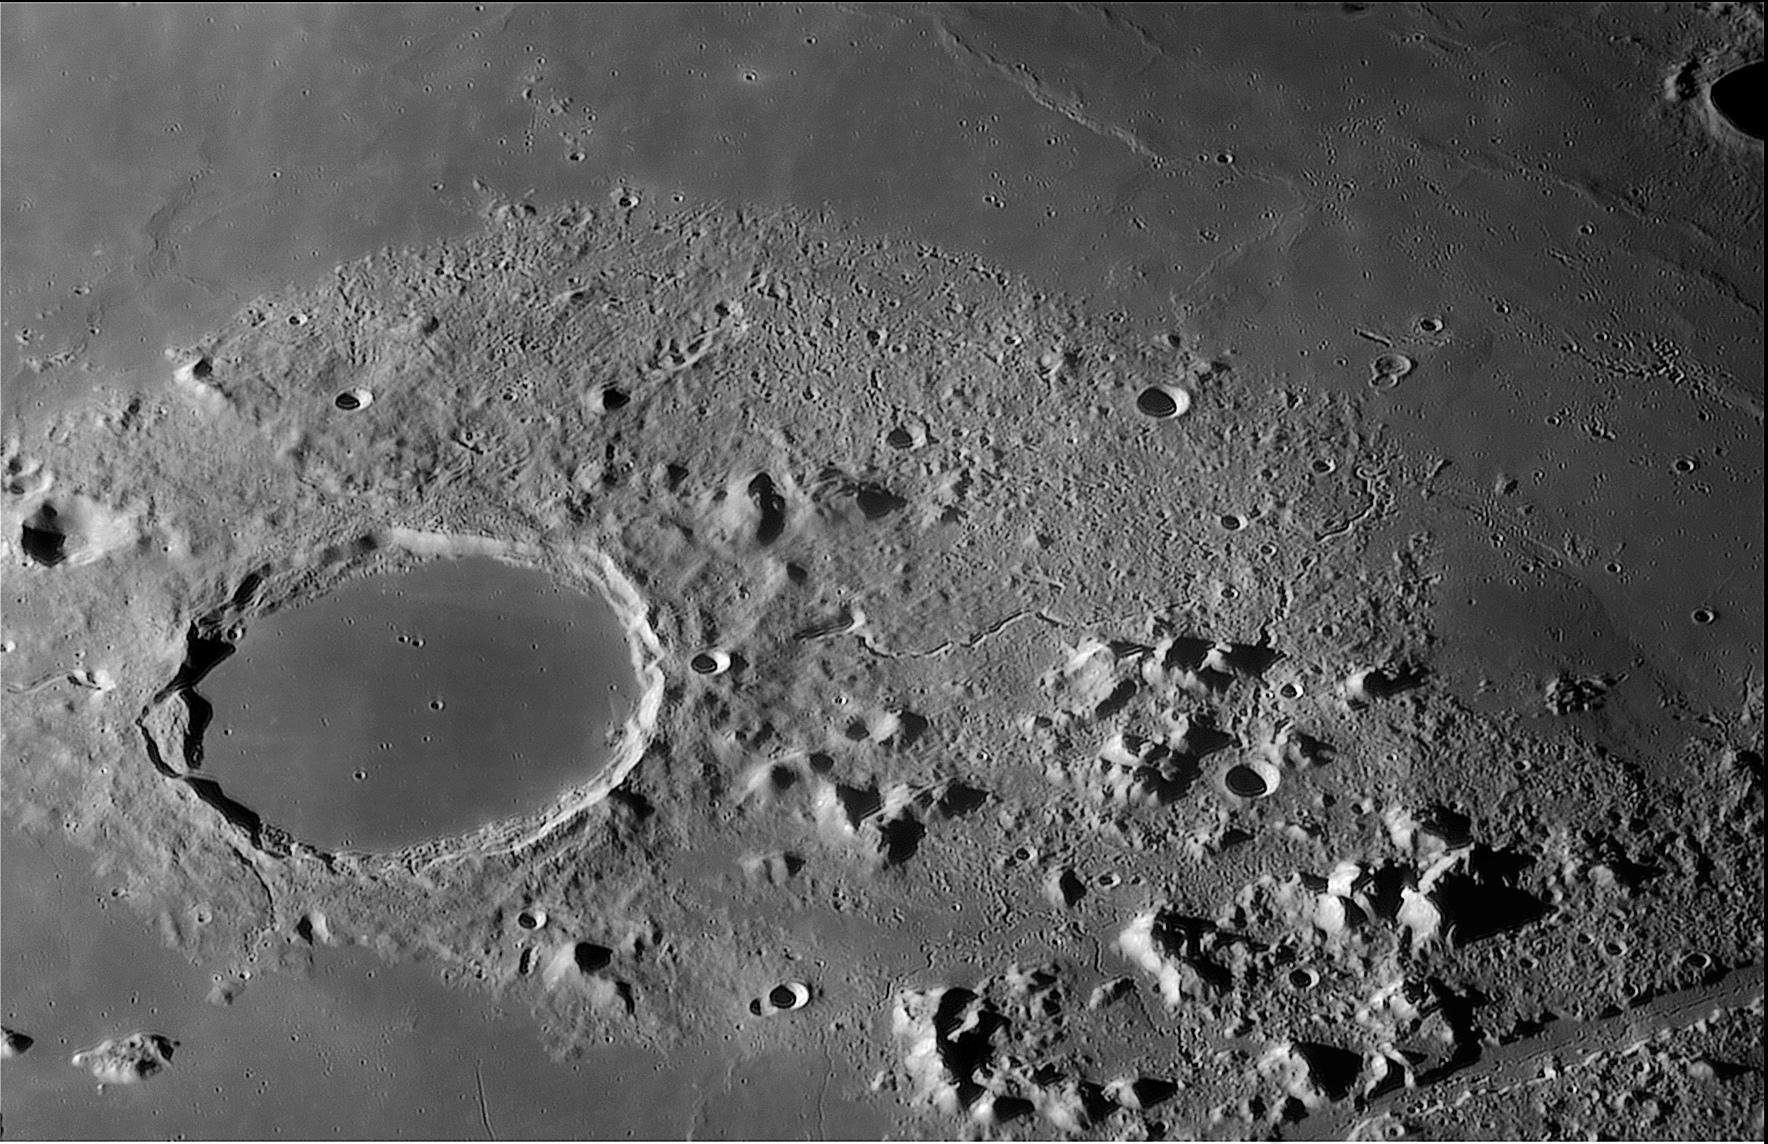 lune__2015-08-06_05h24_Fina.jpg